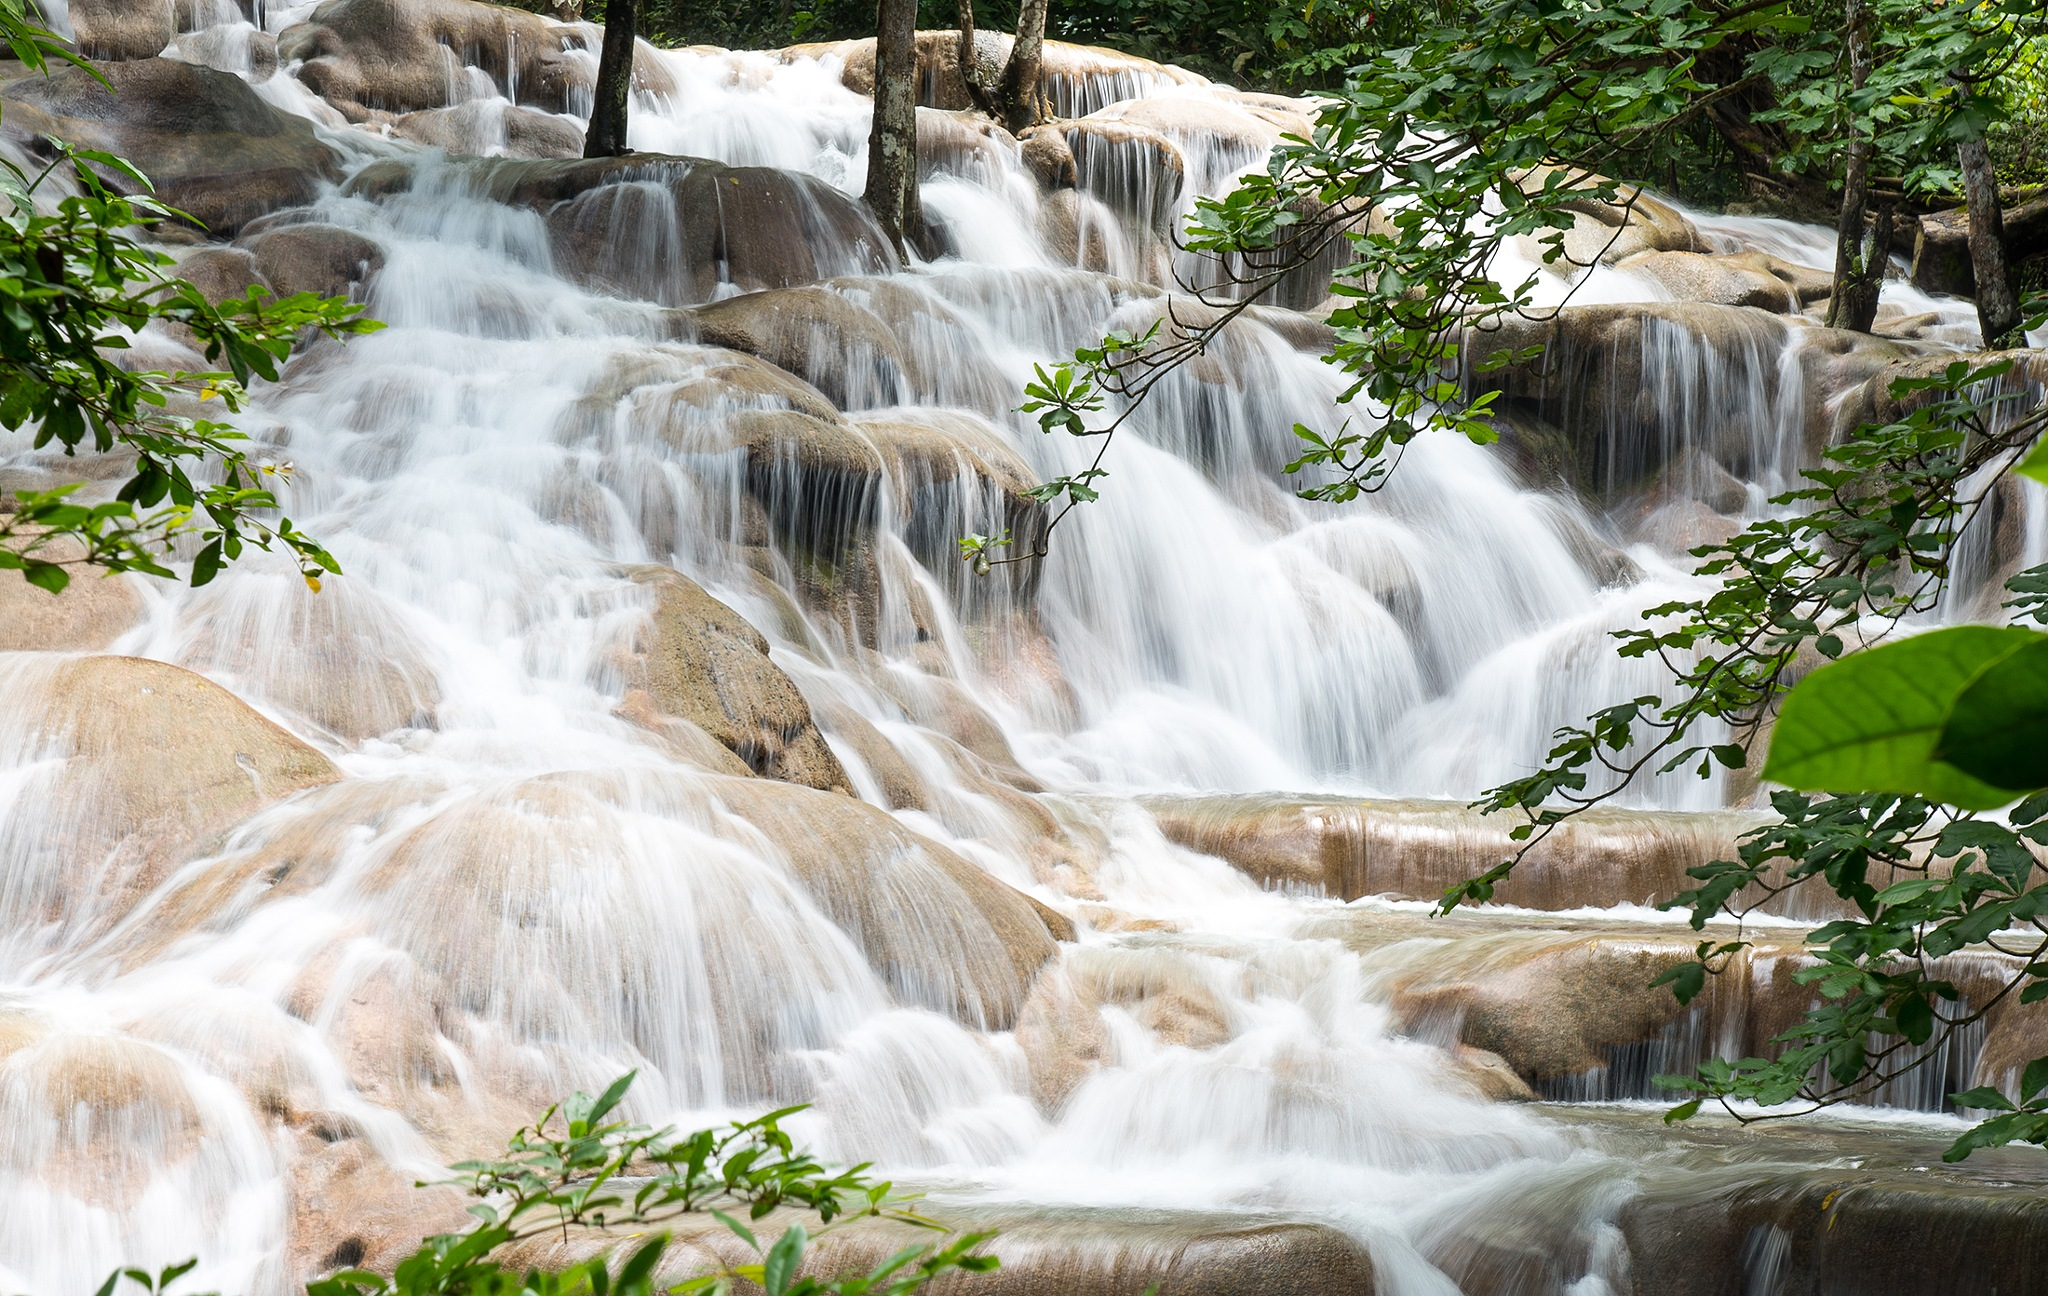 Rocks & Thread Water (Ocho Rios, Jamaica) © Copyright 2018, Verne Varona by VerneVarona